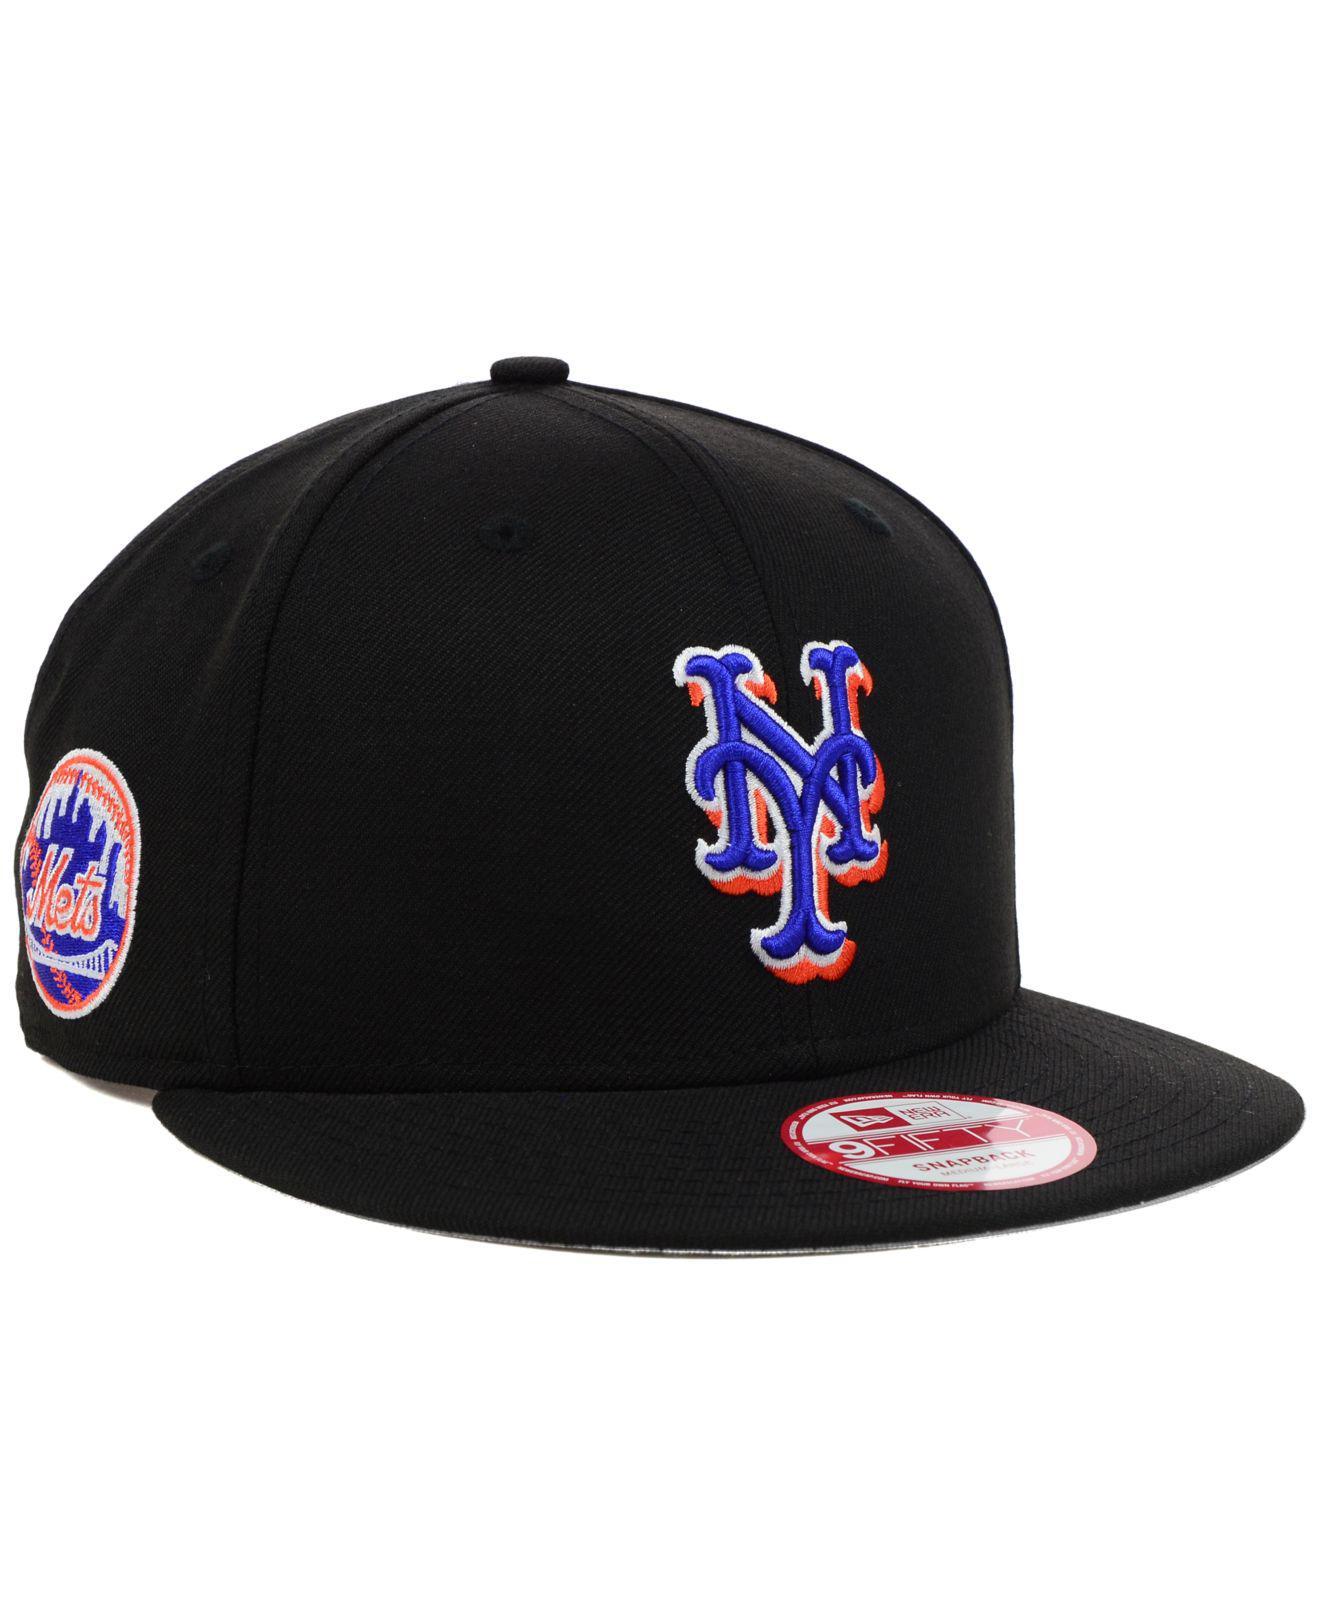 7bca83bf4a276 ... New York Mets Mlb 2 Tone Link 9fifty Snapback Cap for Men -. View  fullscreen